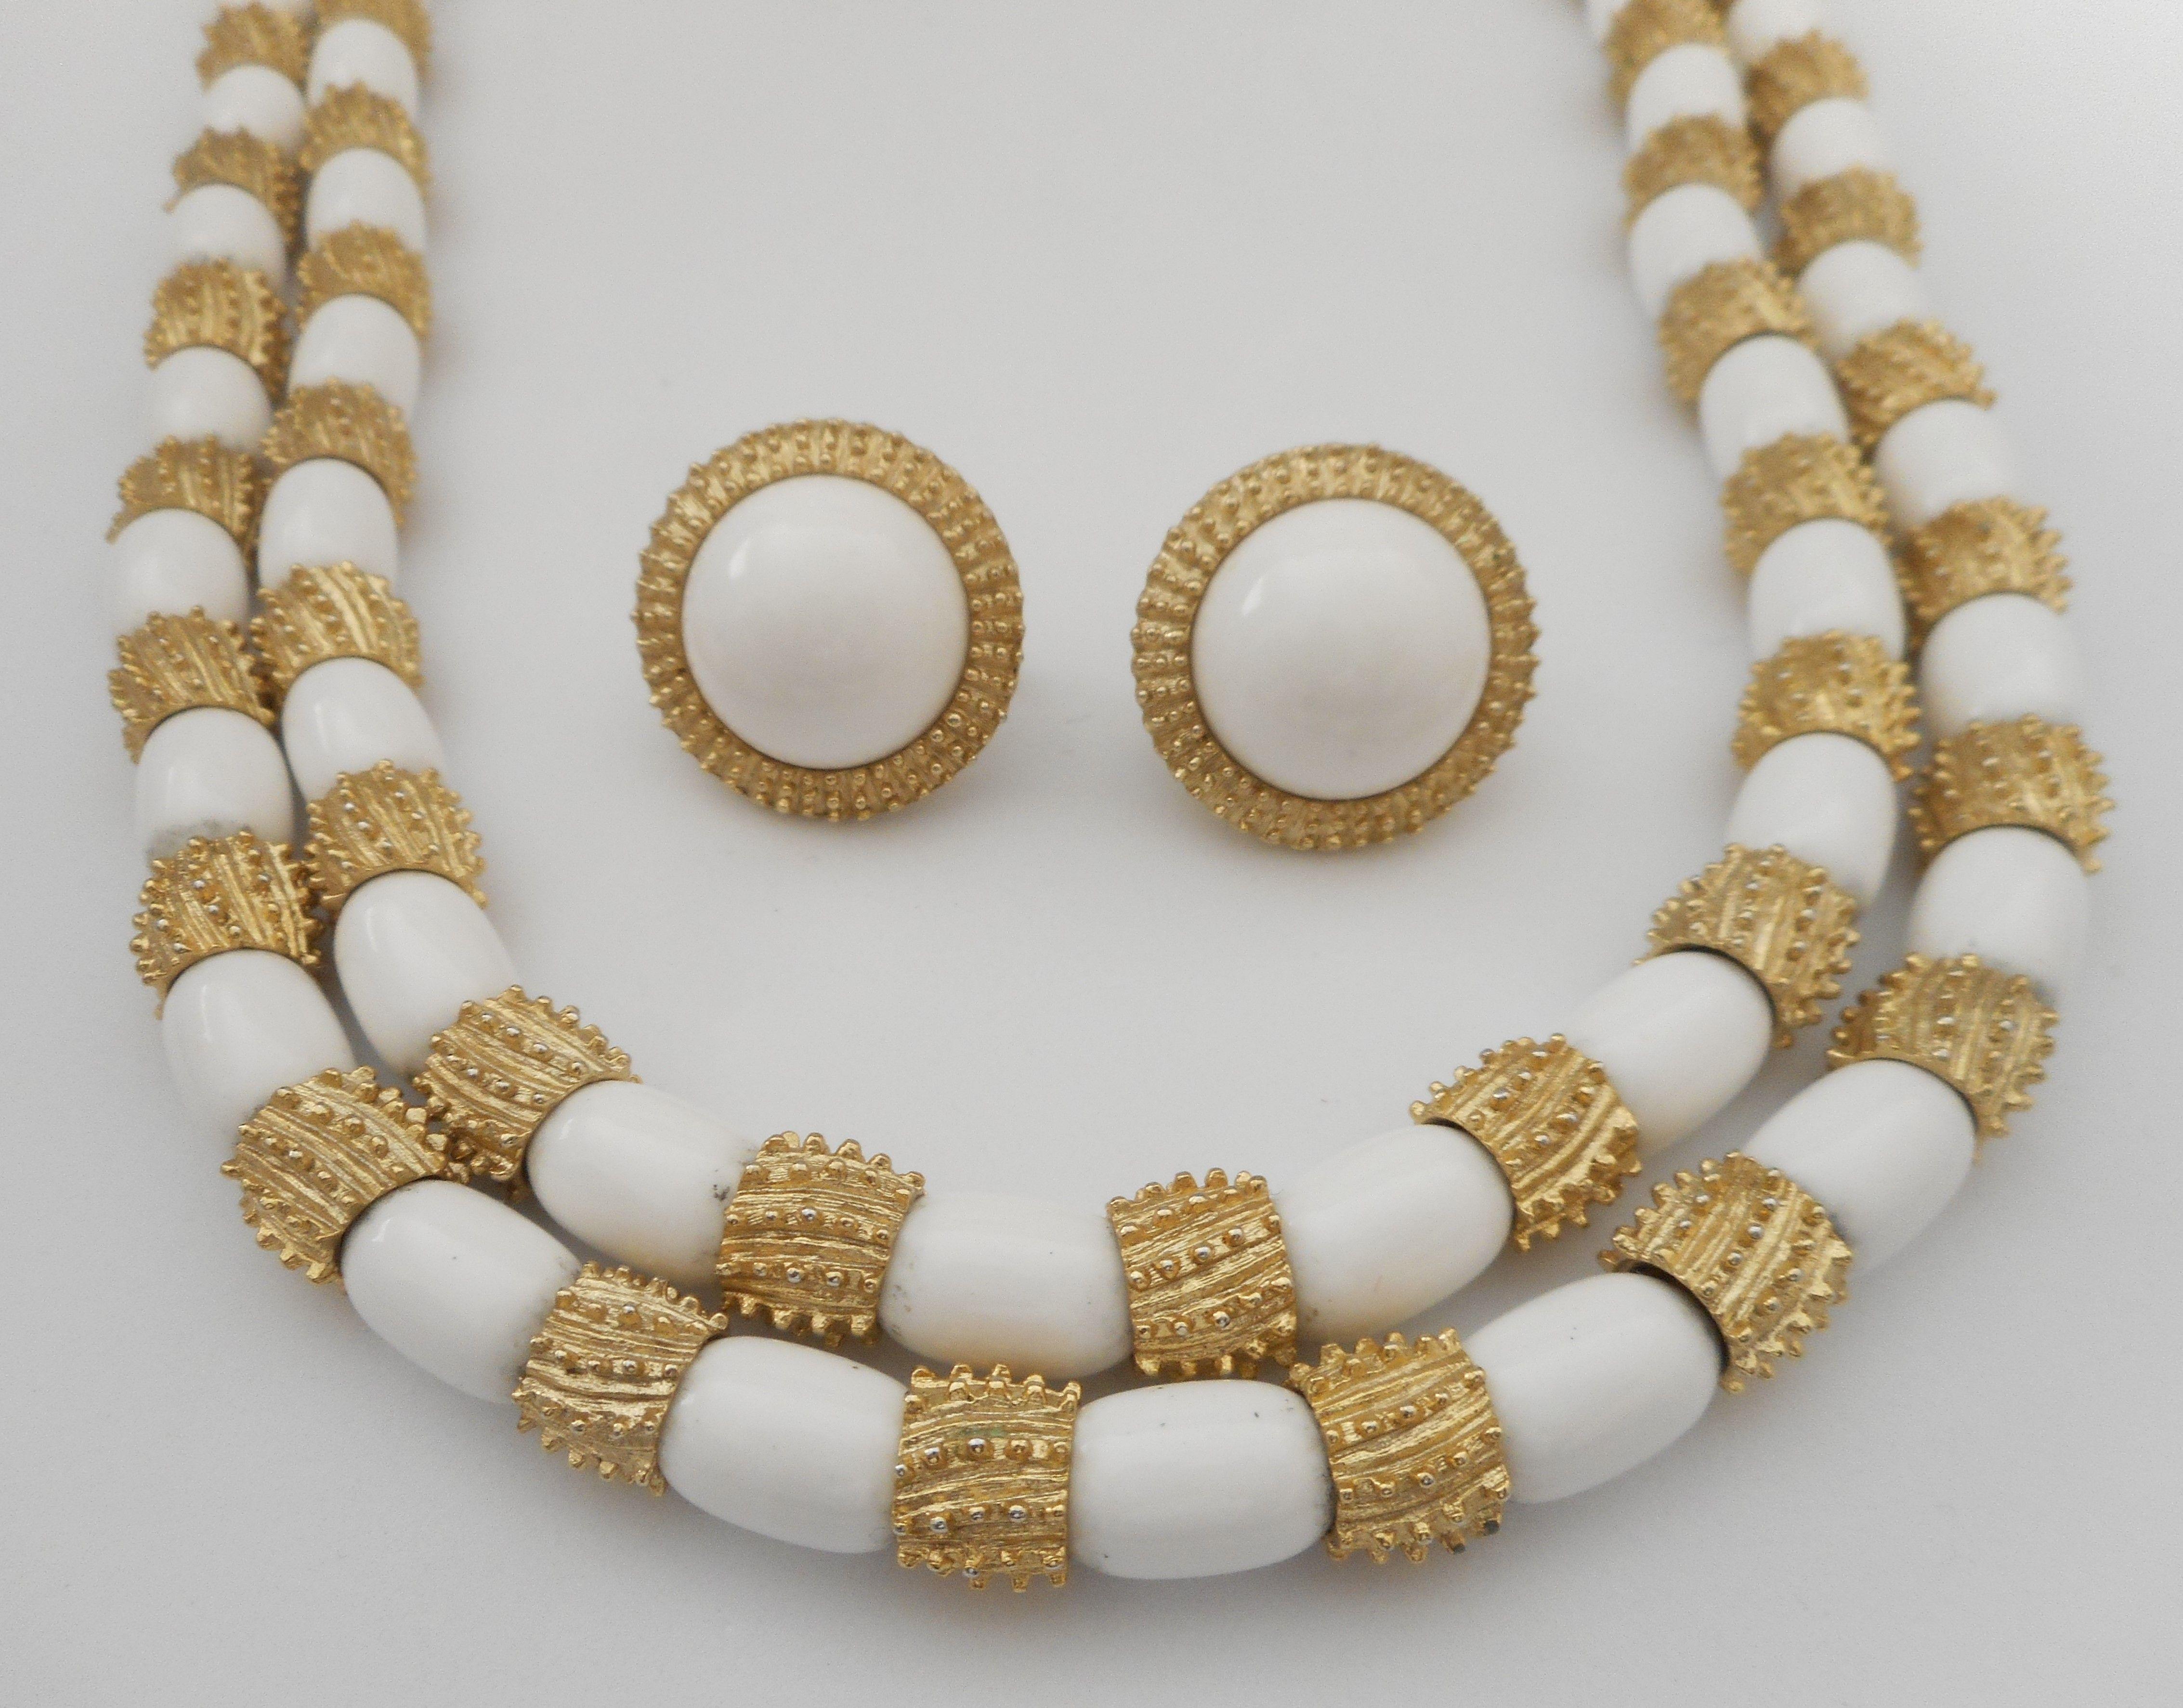 Trifari Beaded Necklace Crown Trifari White and Gold Bead Necklace Trifari White Bead Necklace